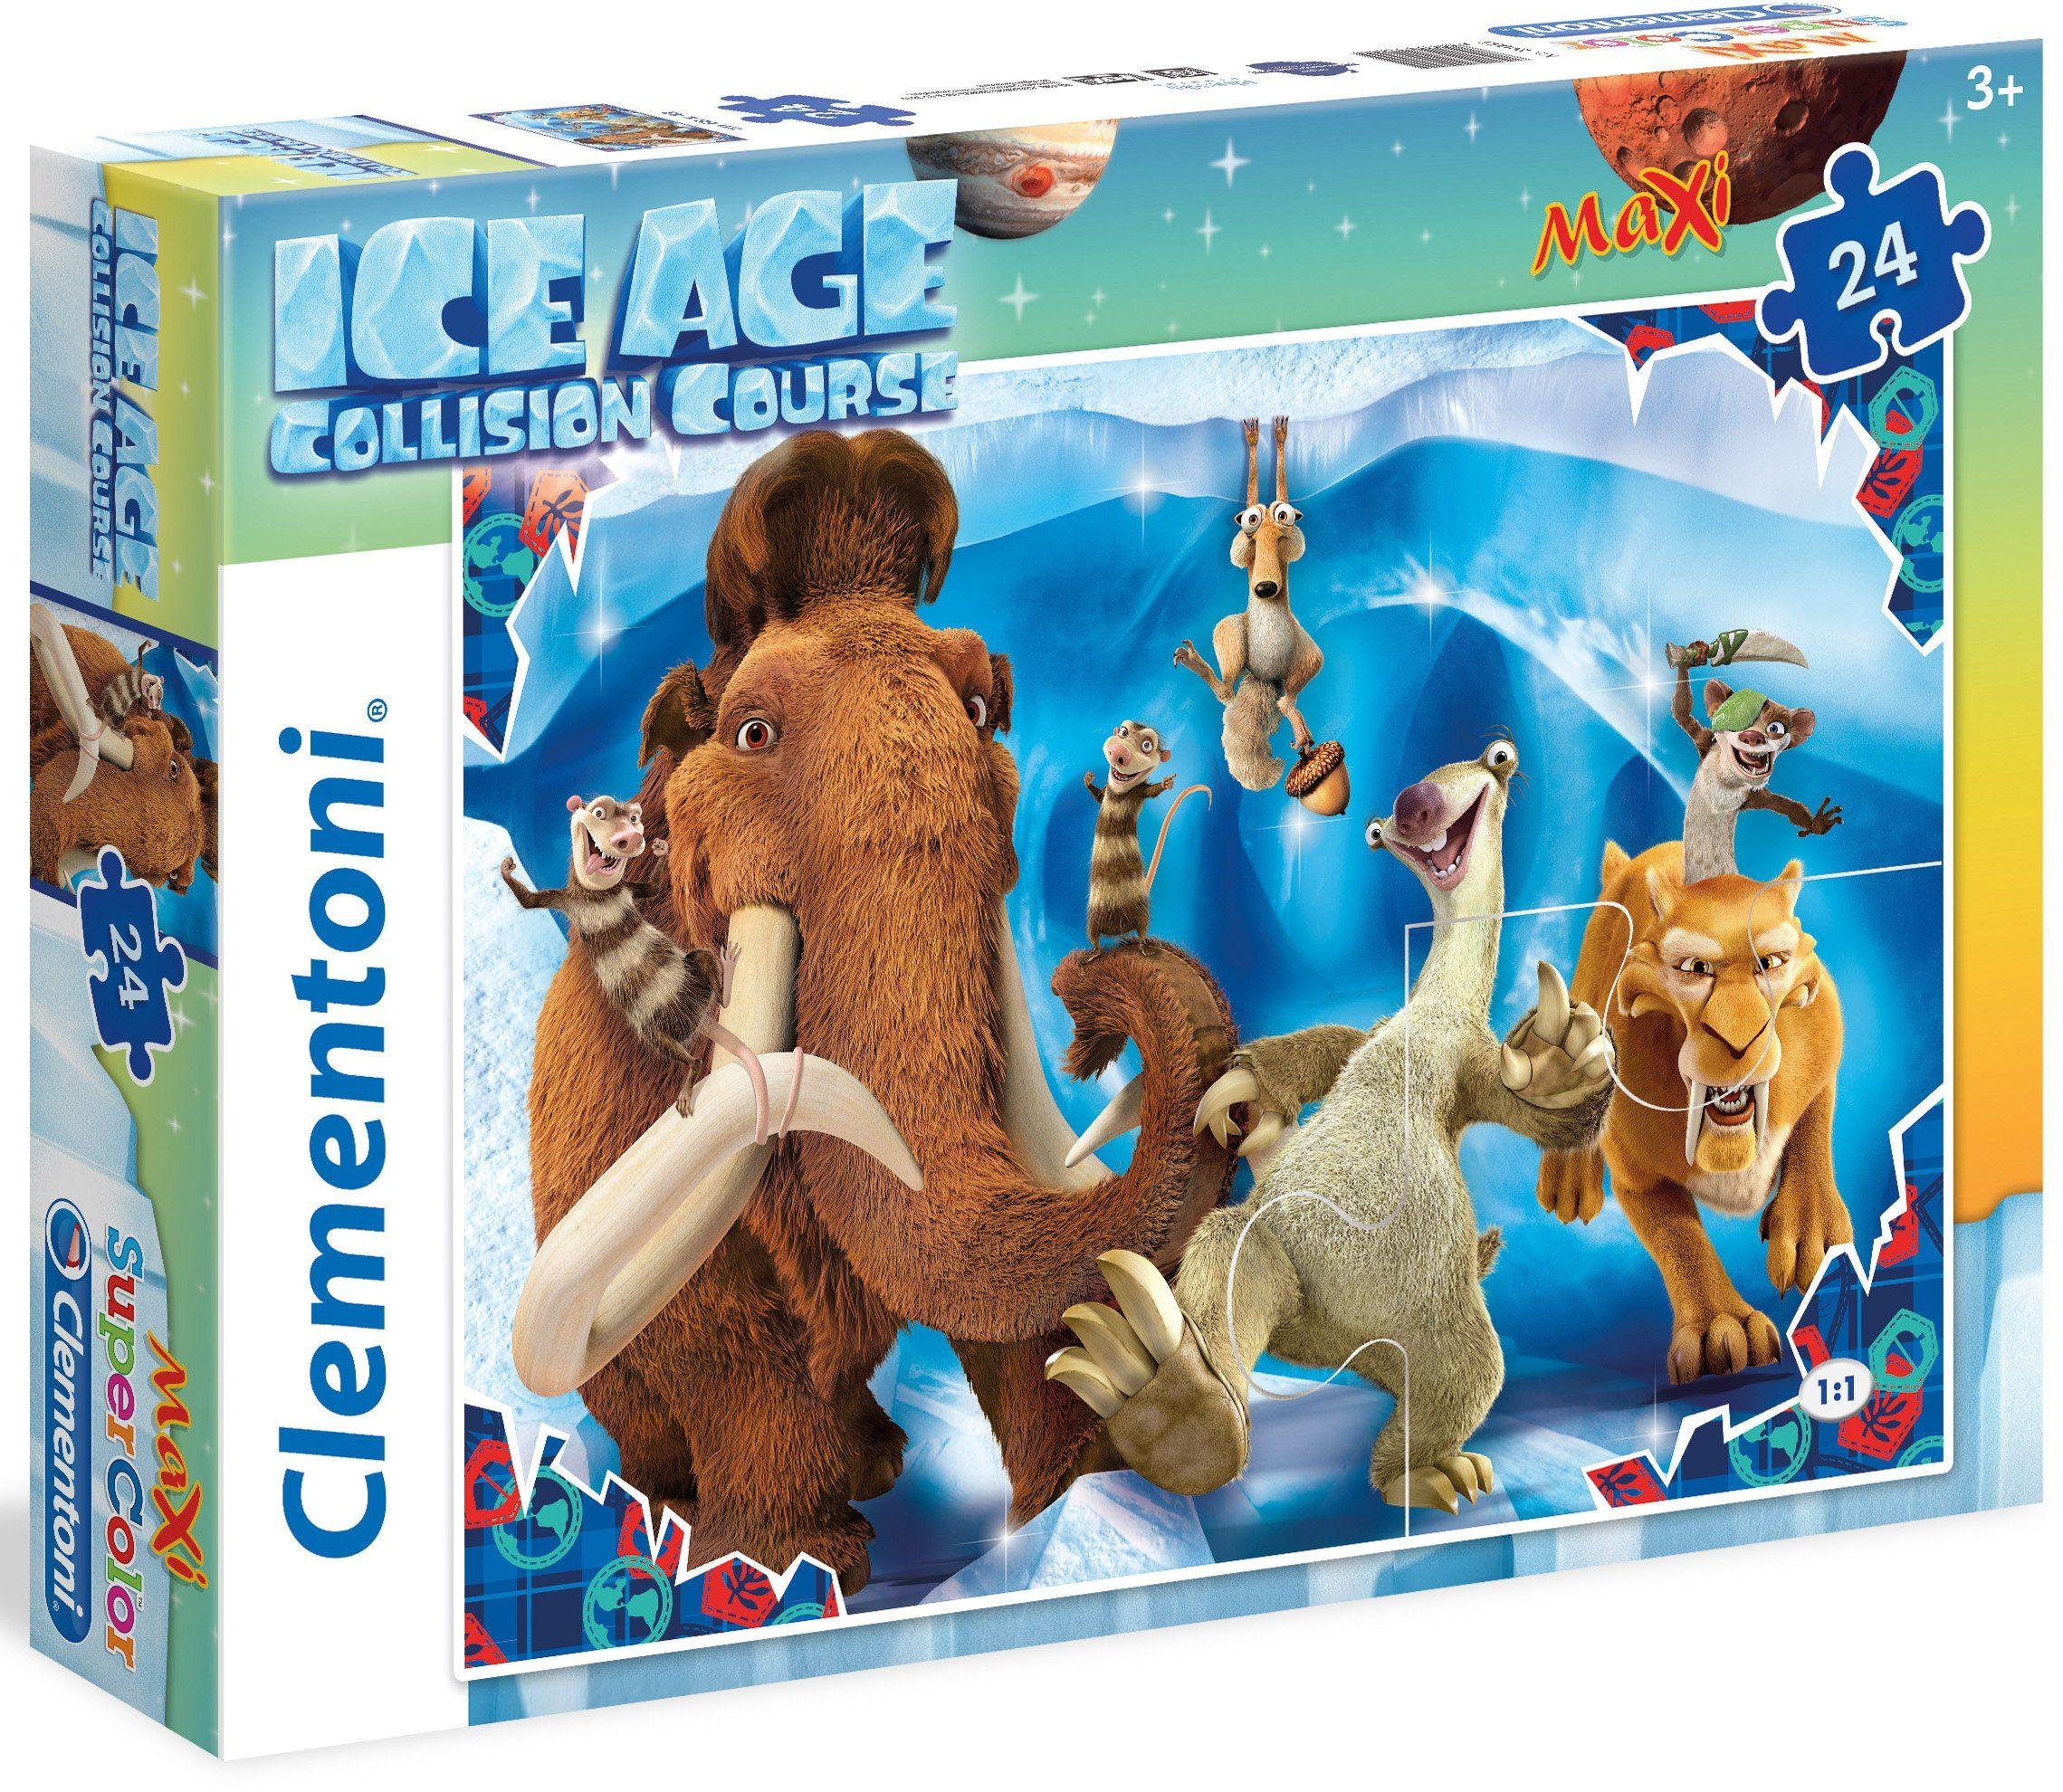 Clementoni Maxi Puzzle, 24 Teile, »Ice Age Collision Course«